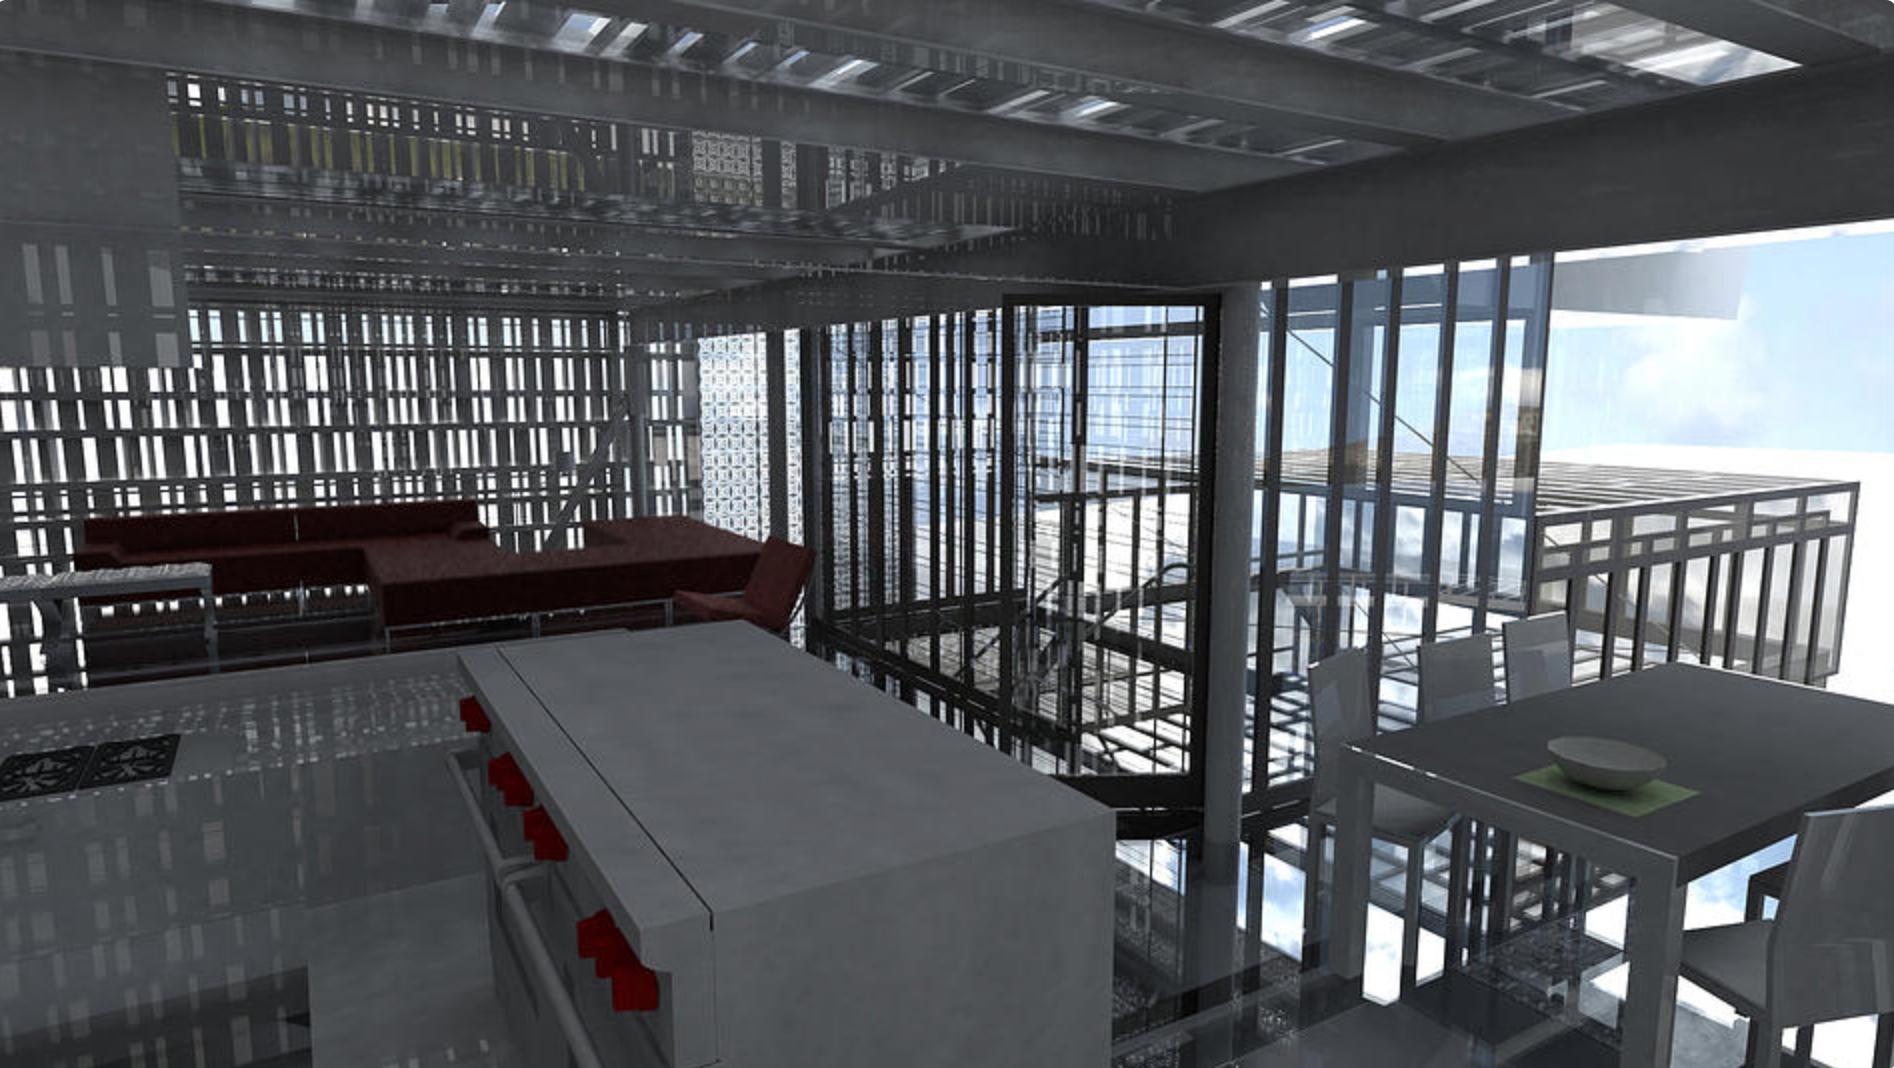 Industrially-designed interiors